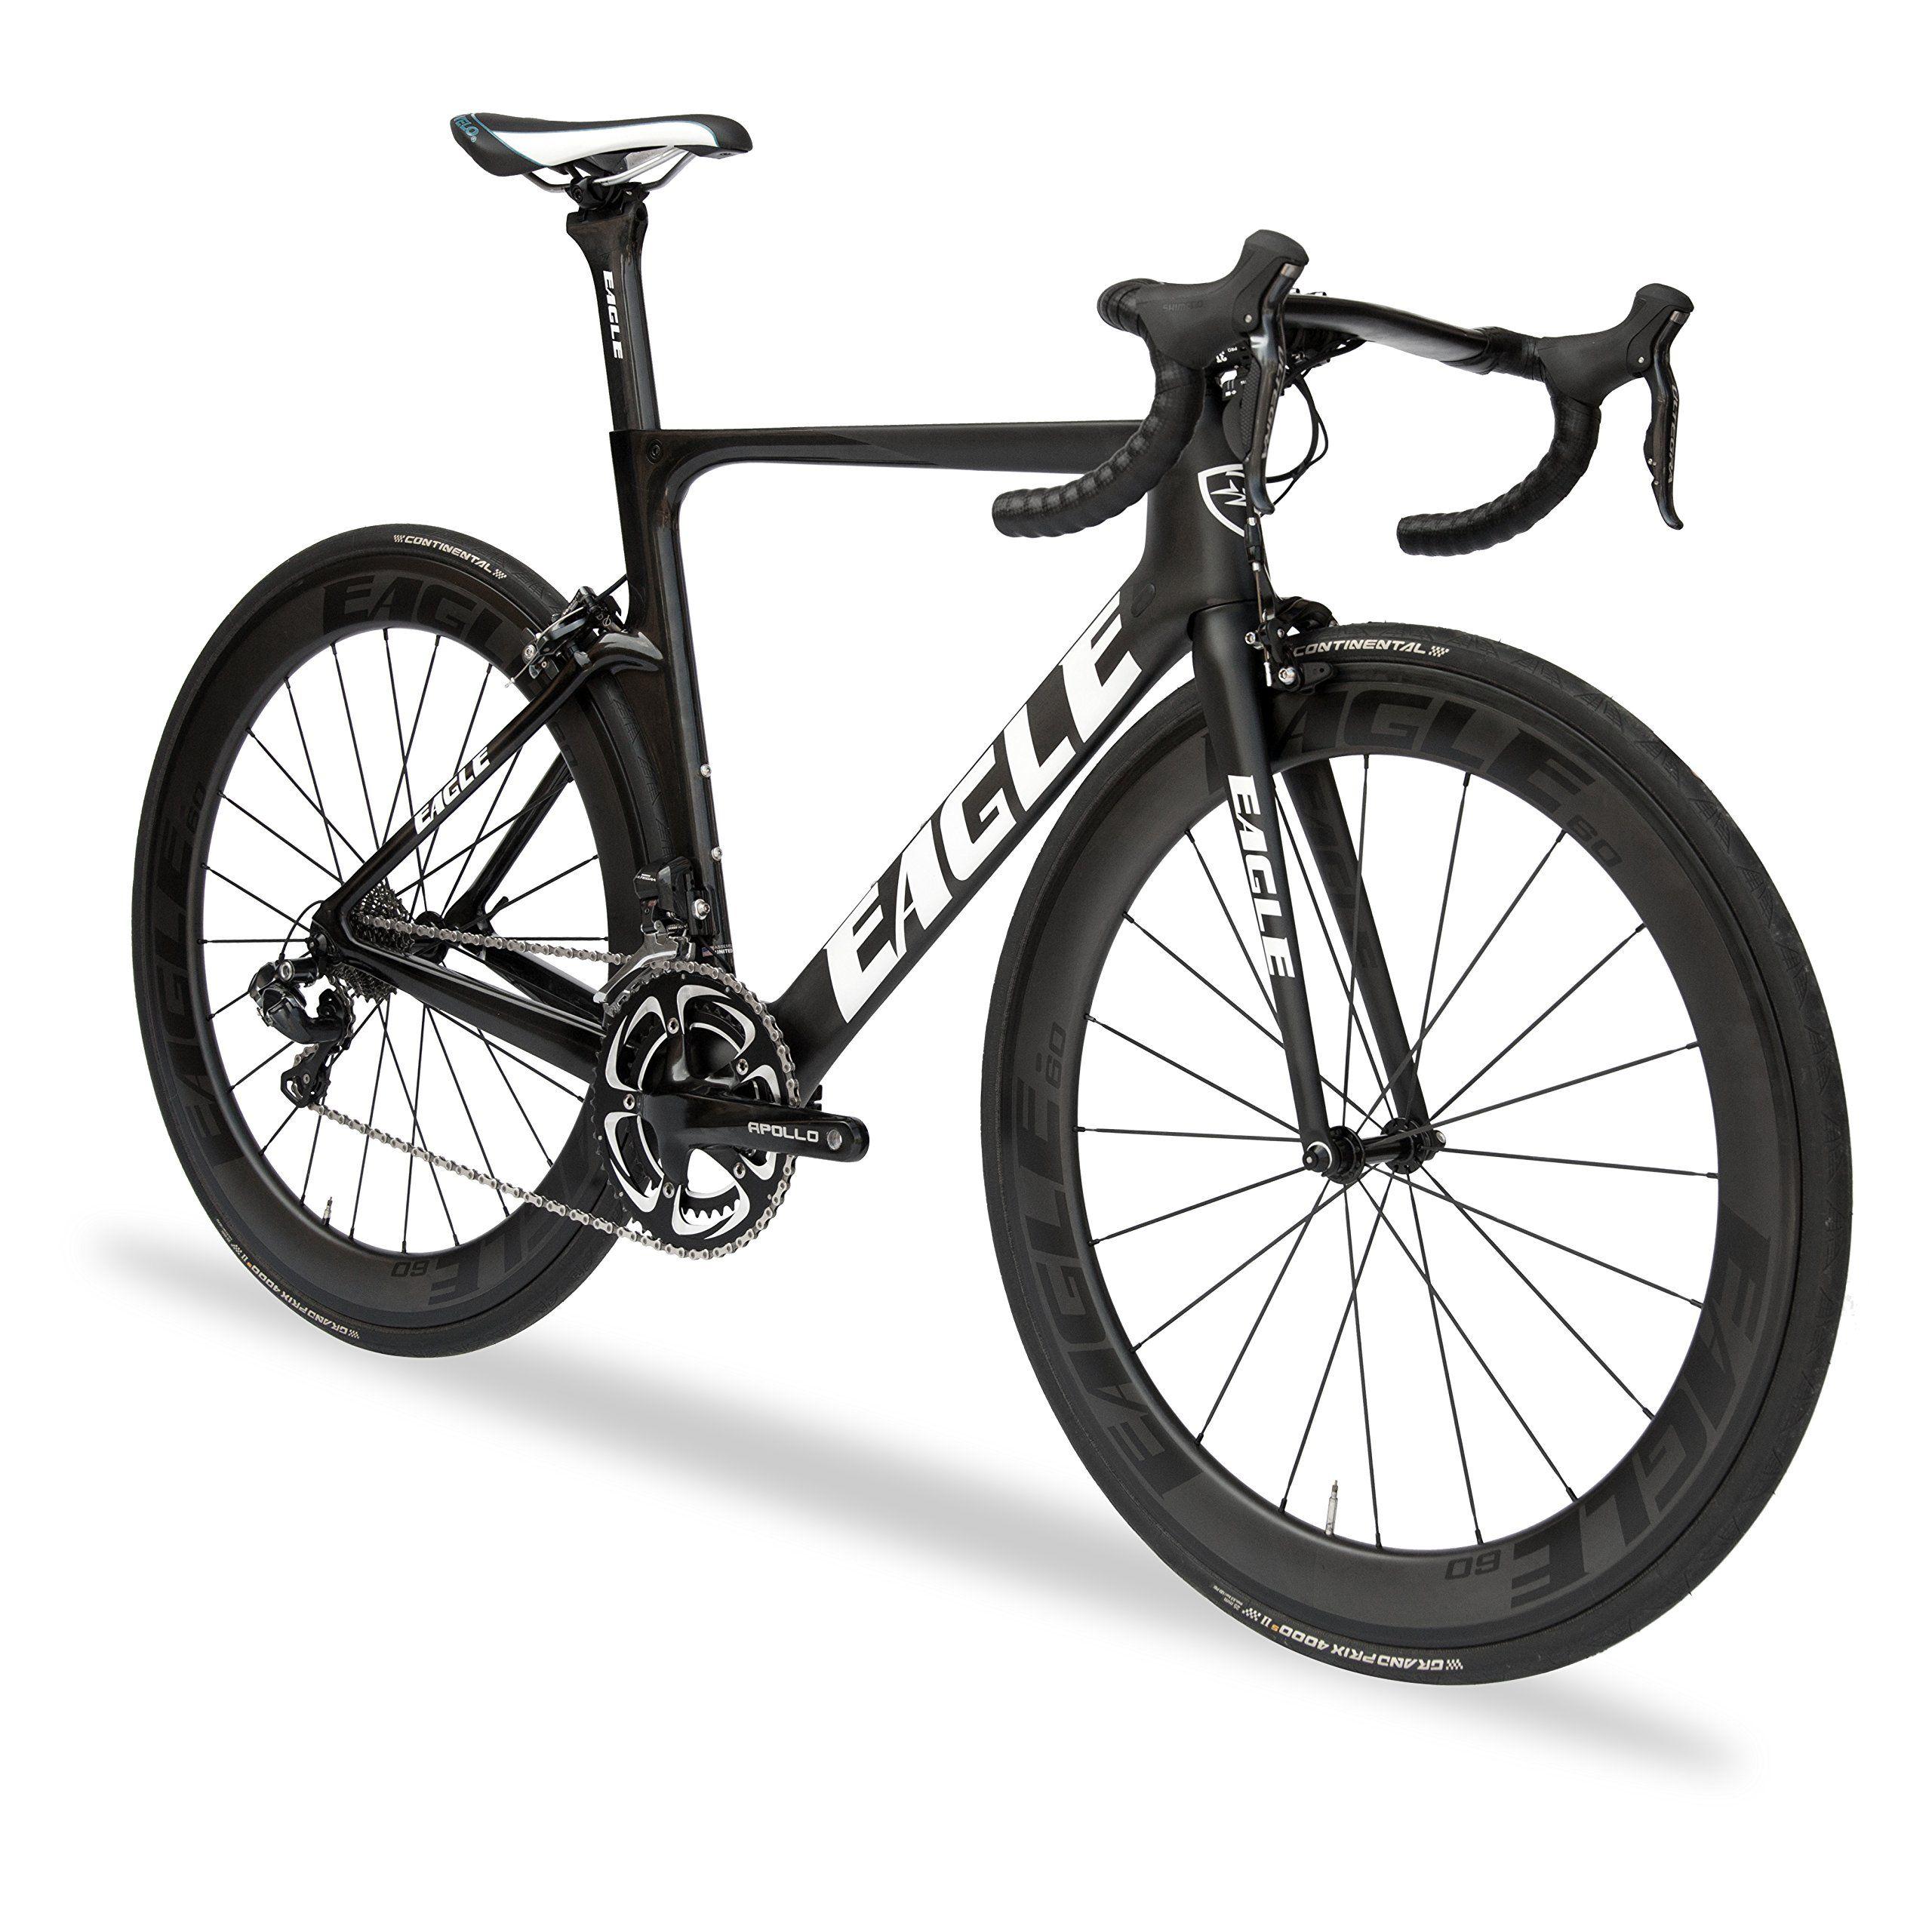 Z3 Eagle Carbon Aero Road Bike - Shimano Ultegra Di2 - US Assembled ...